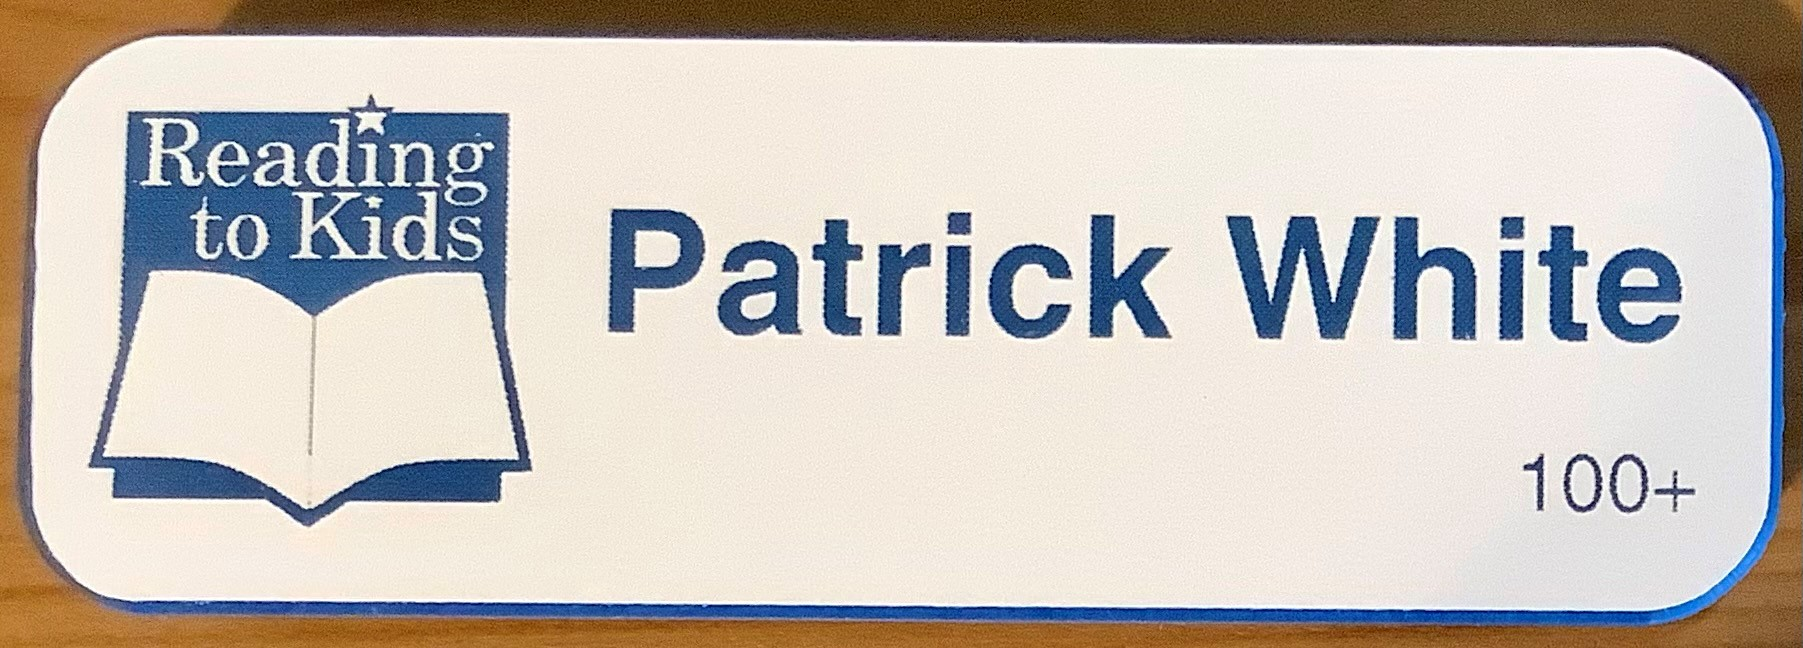 Patrick White 100th Name Badge